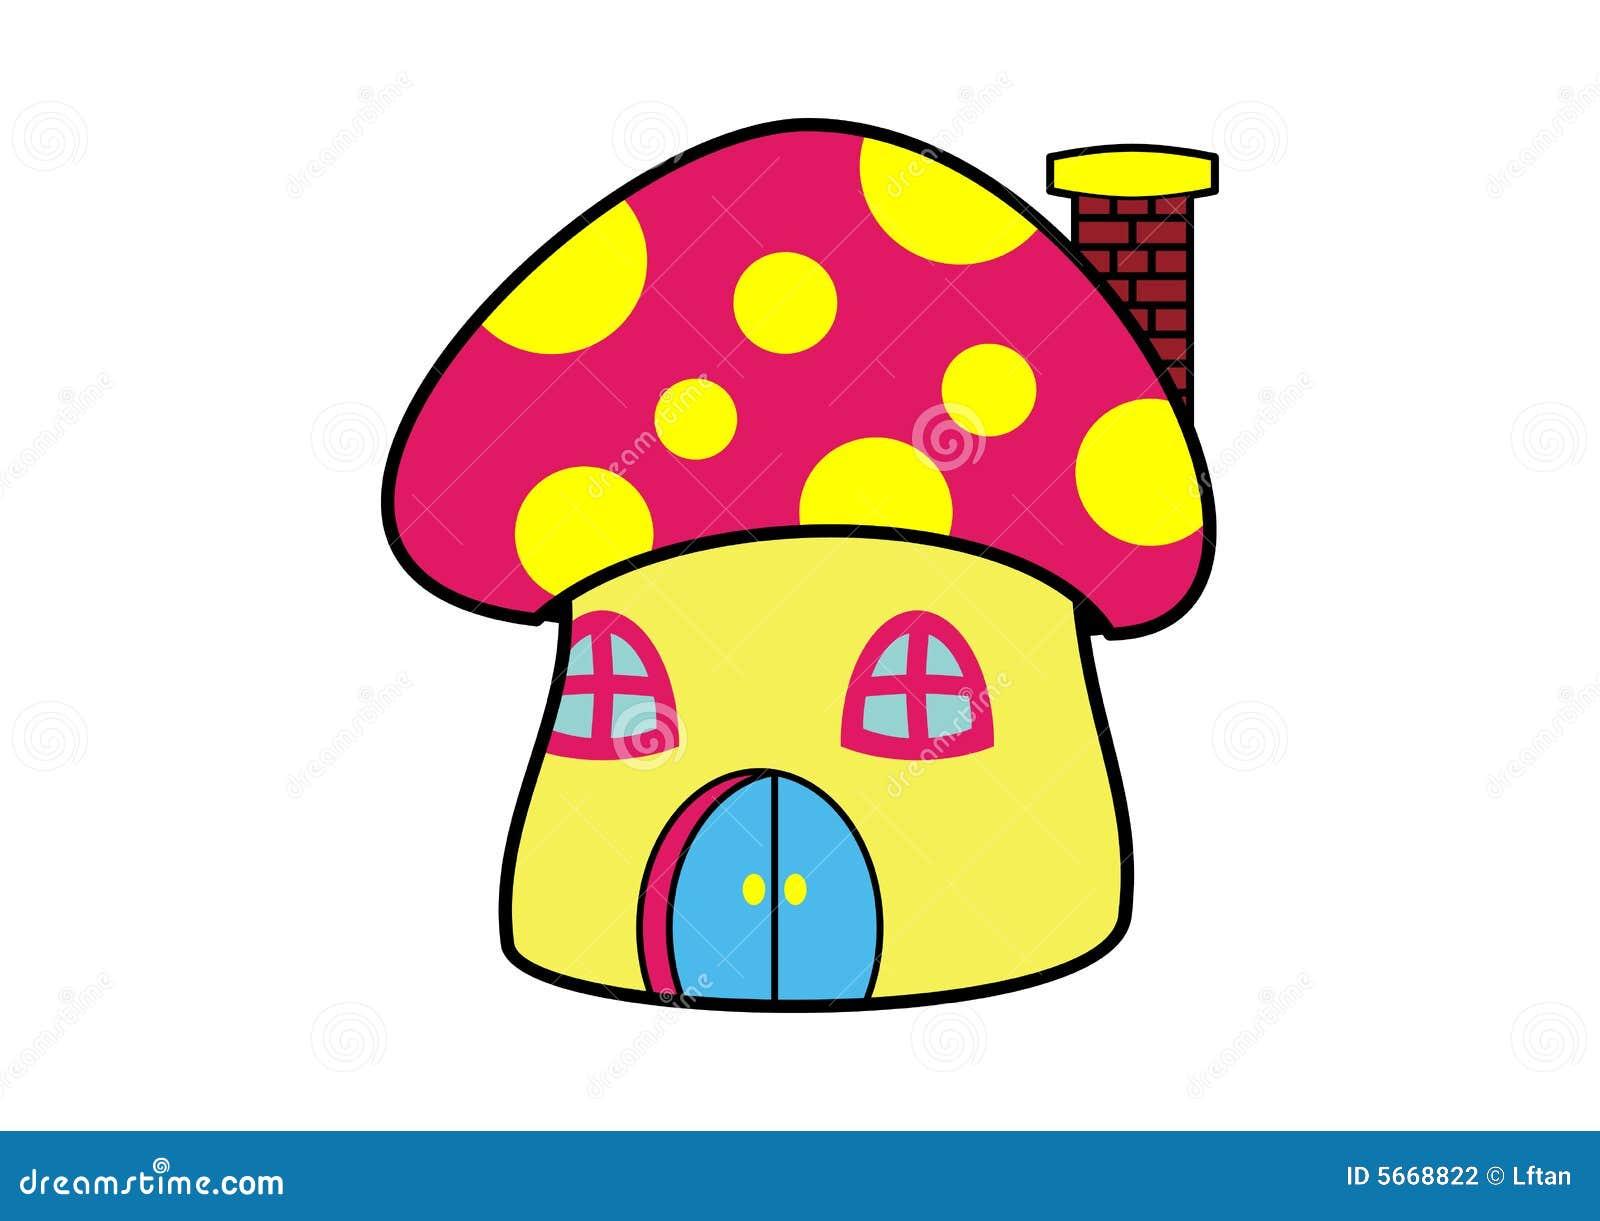 Mushroom Clip Art Stock Photography